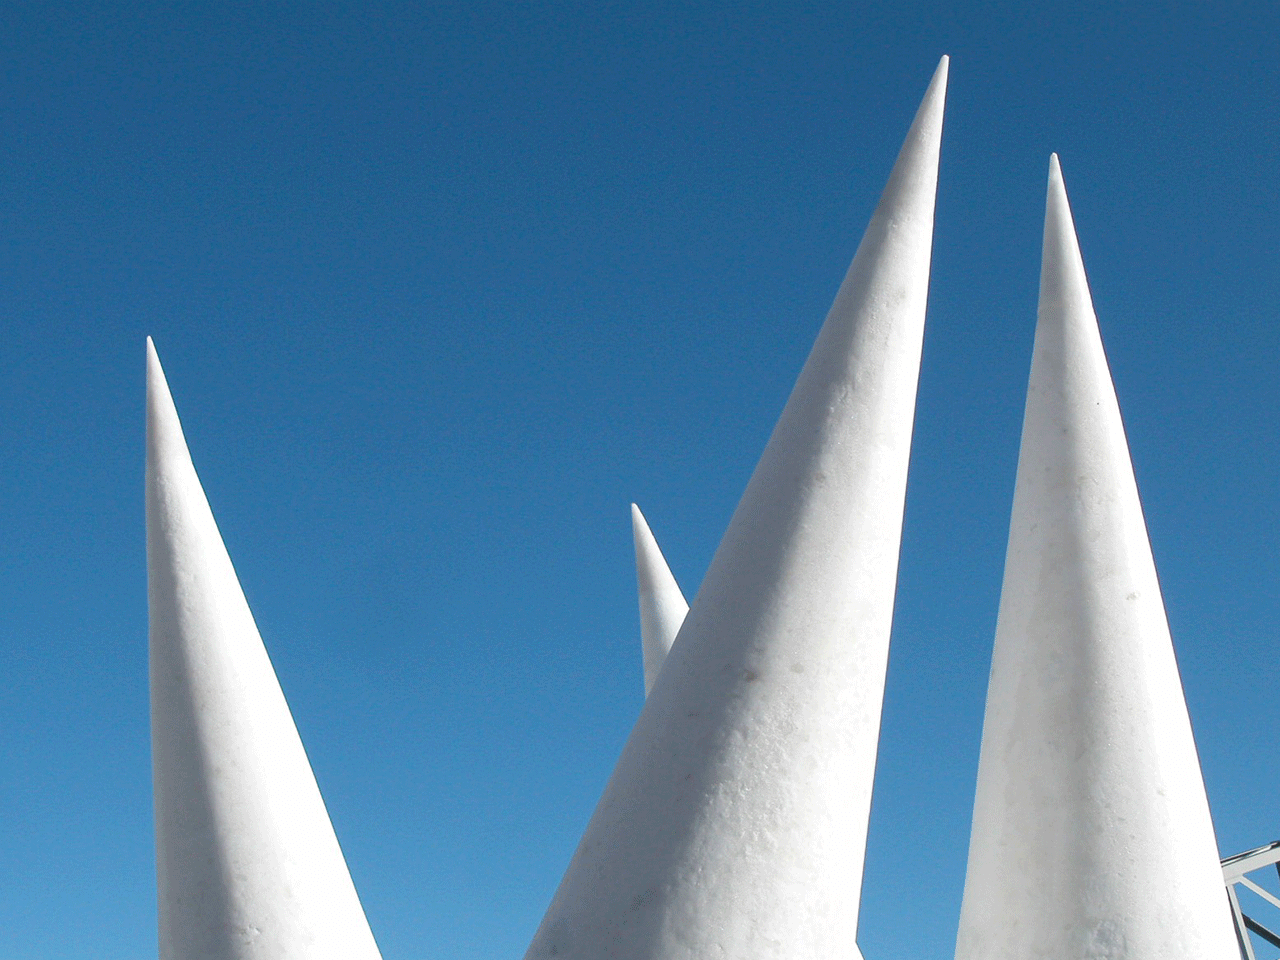 Schneeskulptur ROCK'N' ROLL 2007